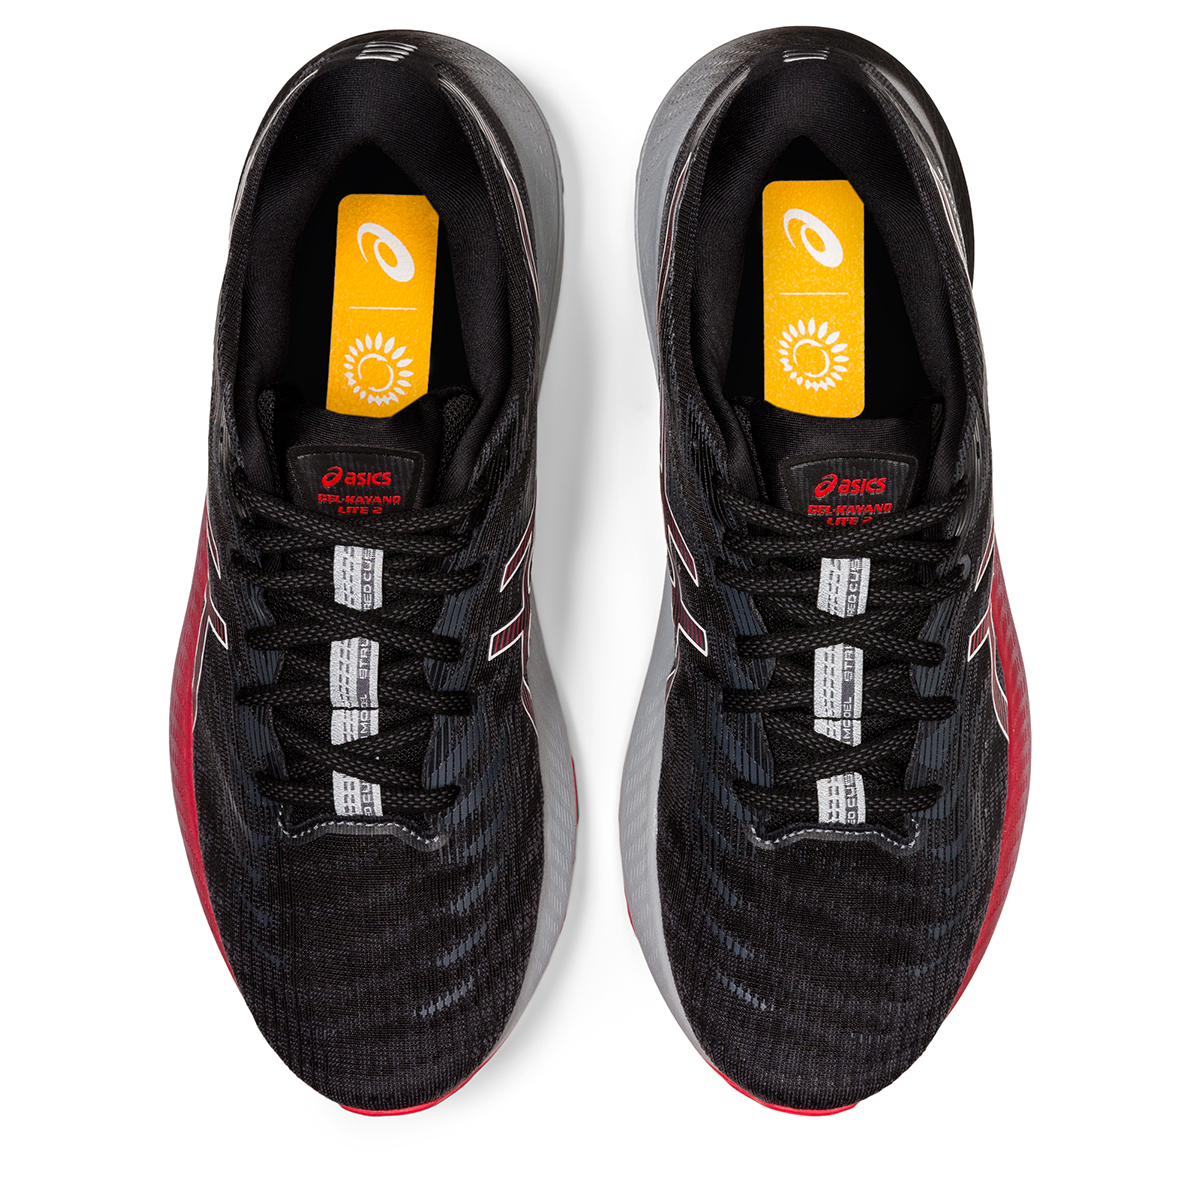 Men's Asics Gel-Kayano Lite 2 Running Shoe - Color: Black/White - Size: 7 - Width: Regular, Black/White, large, image 3